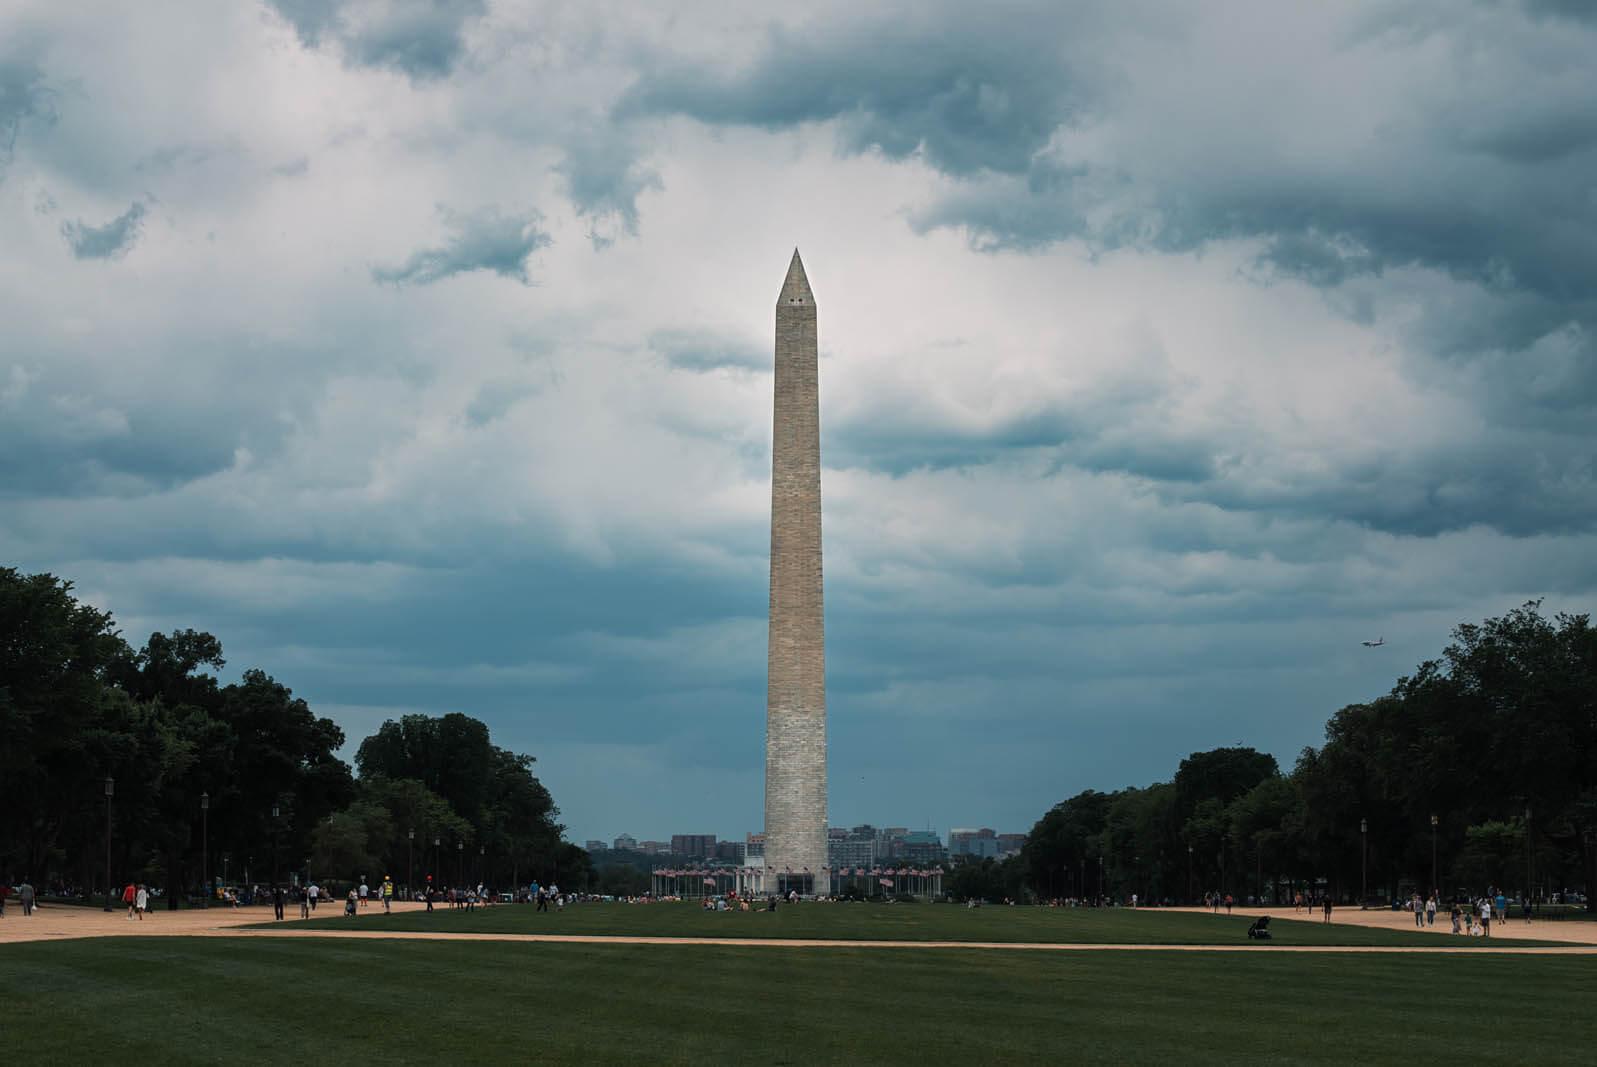 Washington Monument on the National Mall in Washington DC